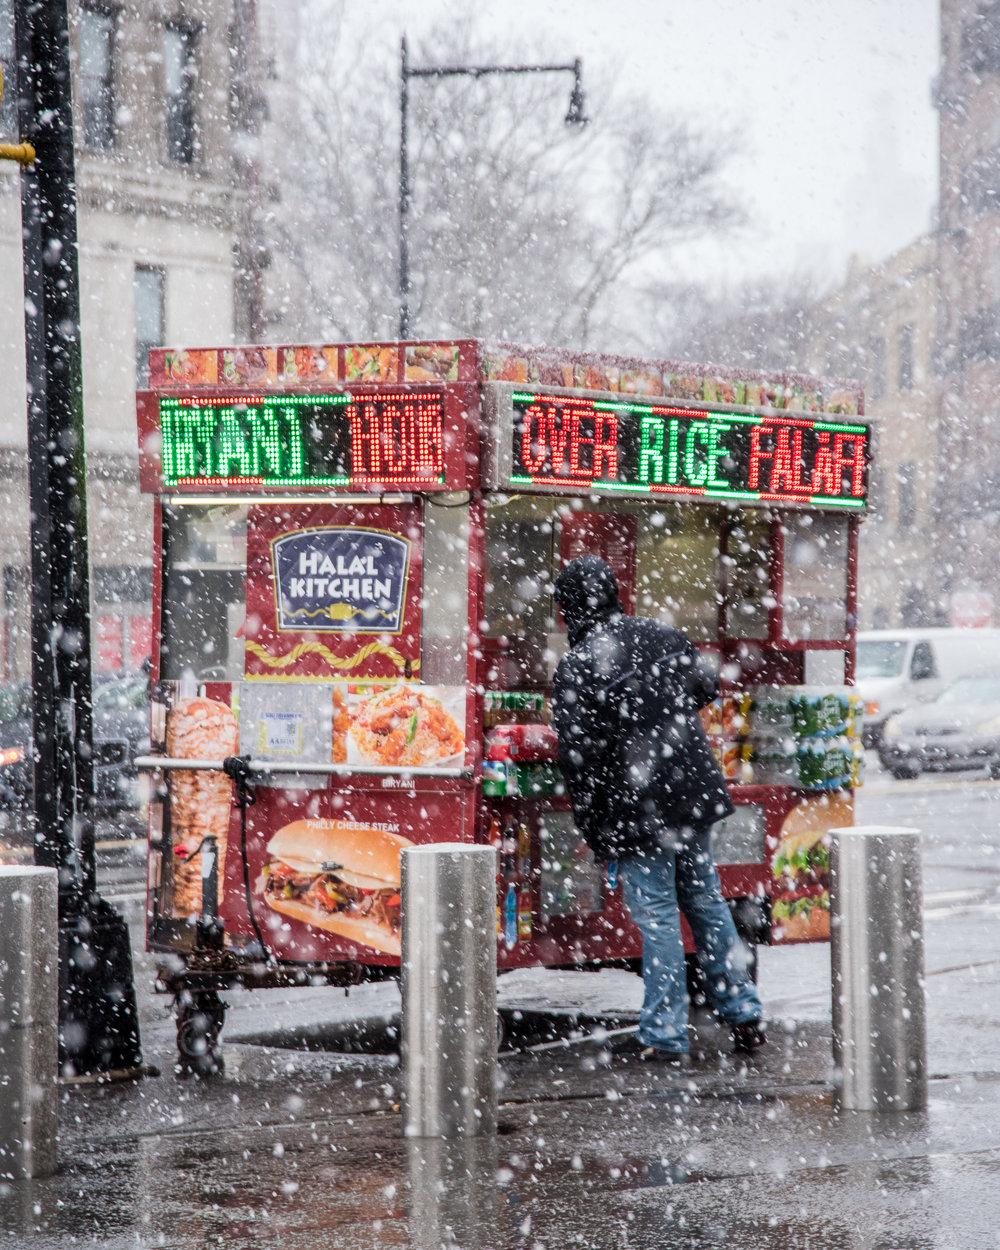 Snow over rice falafel. 2018.